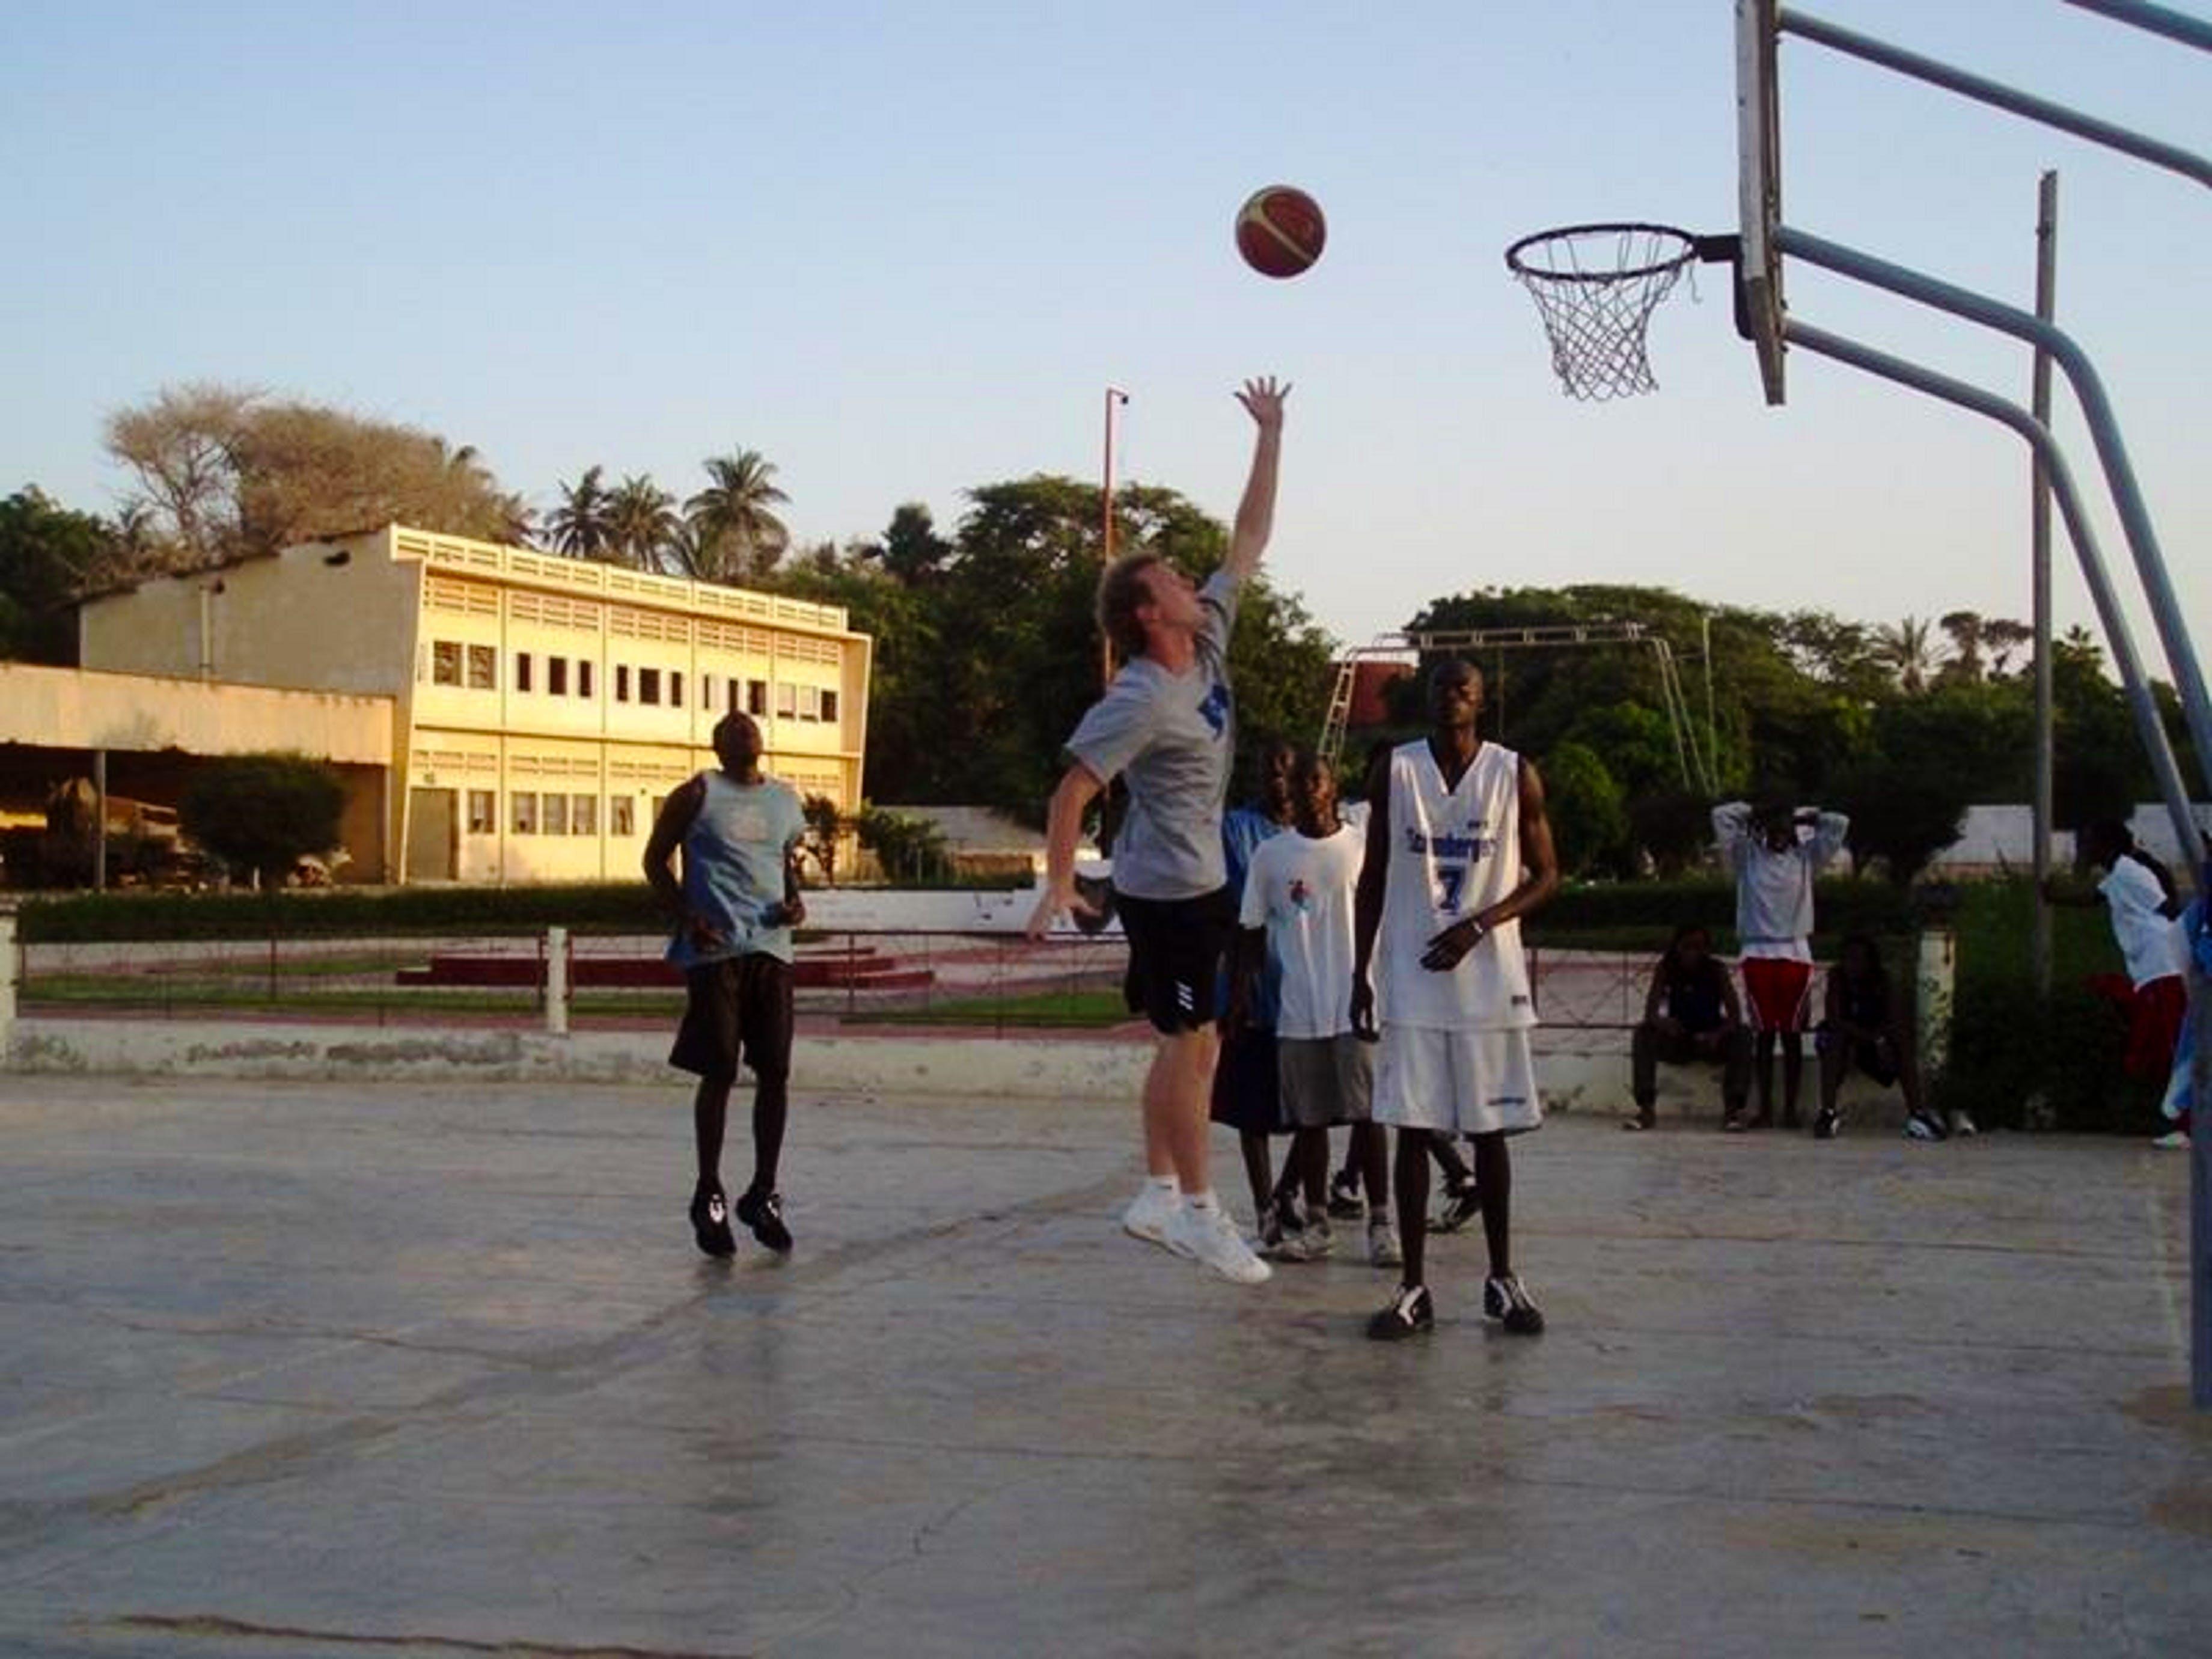 Youth BasketBall Coach